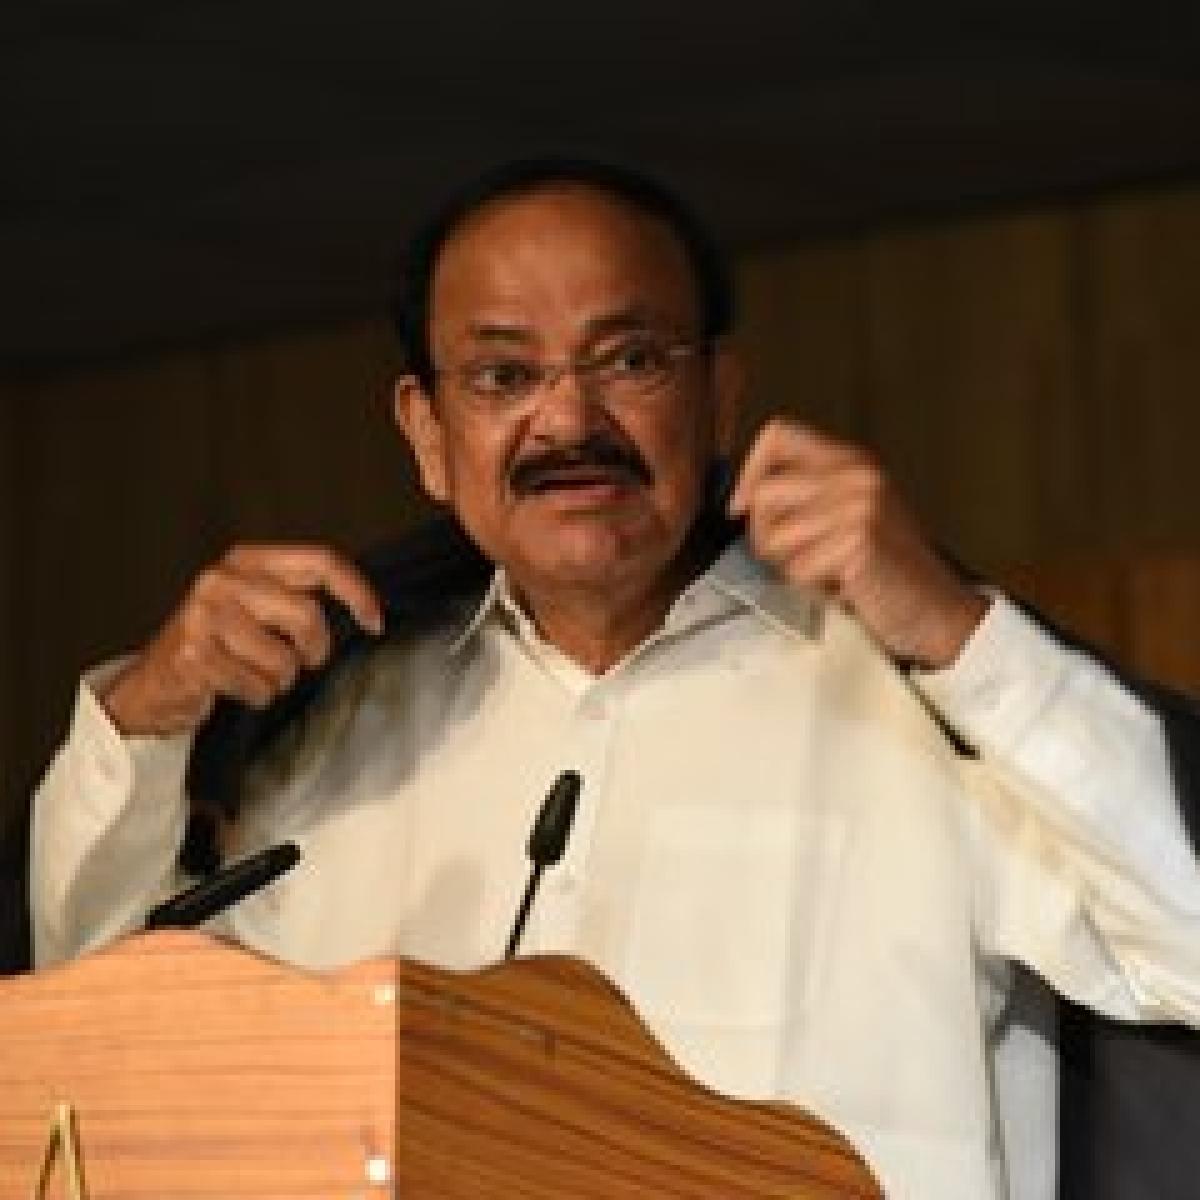 Parties should control 'unruly behaviour' of its MPs: Naidu